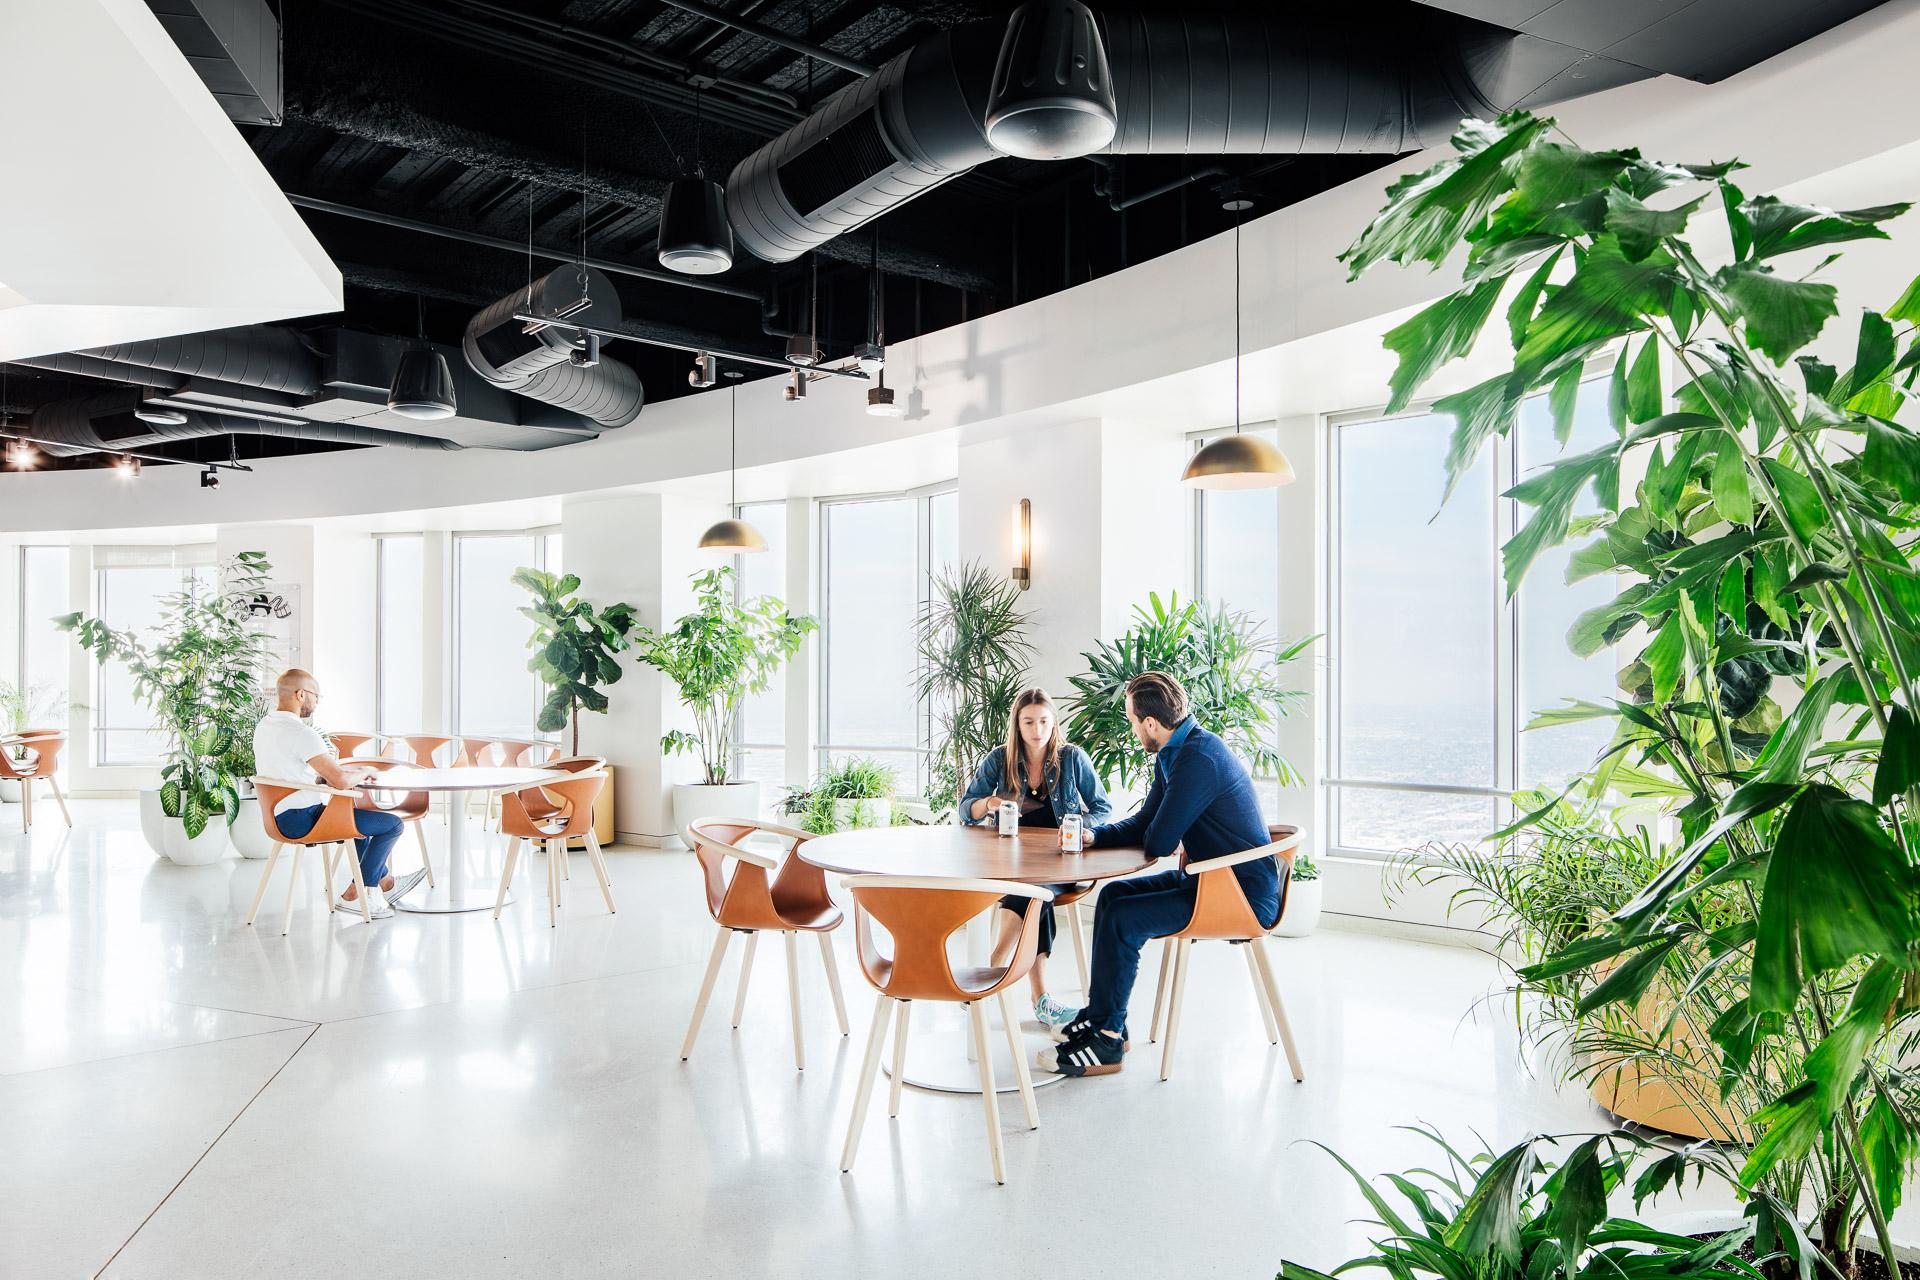 architectural-restaurant-interiors-photographer-los-angeles-oue-skyspace-dtla-9.jpg